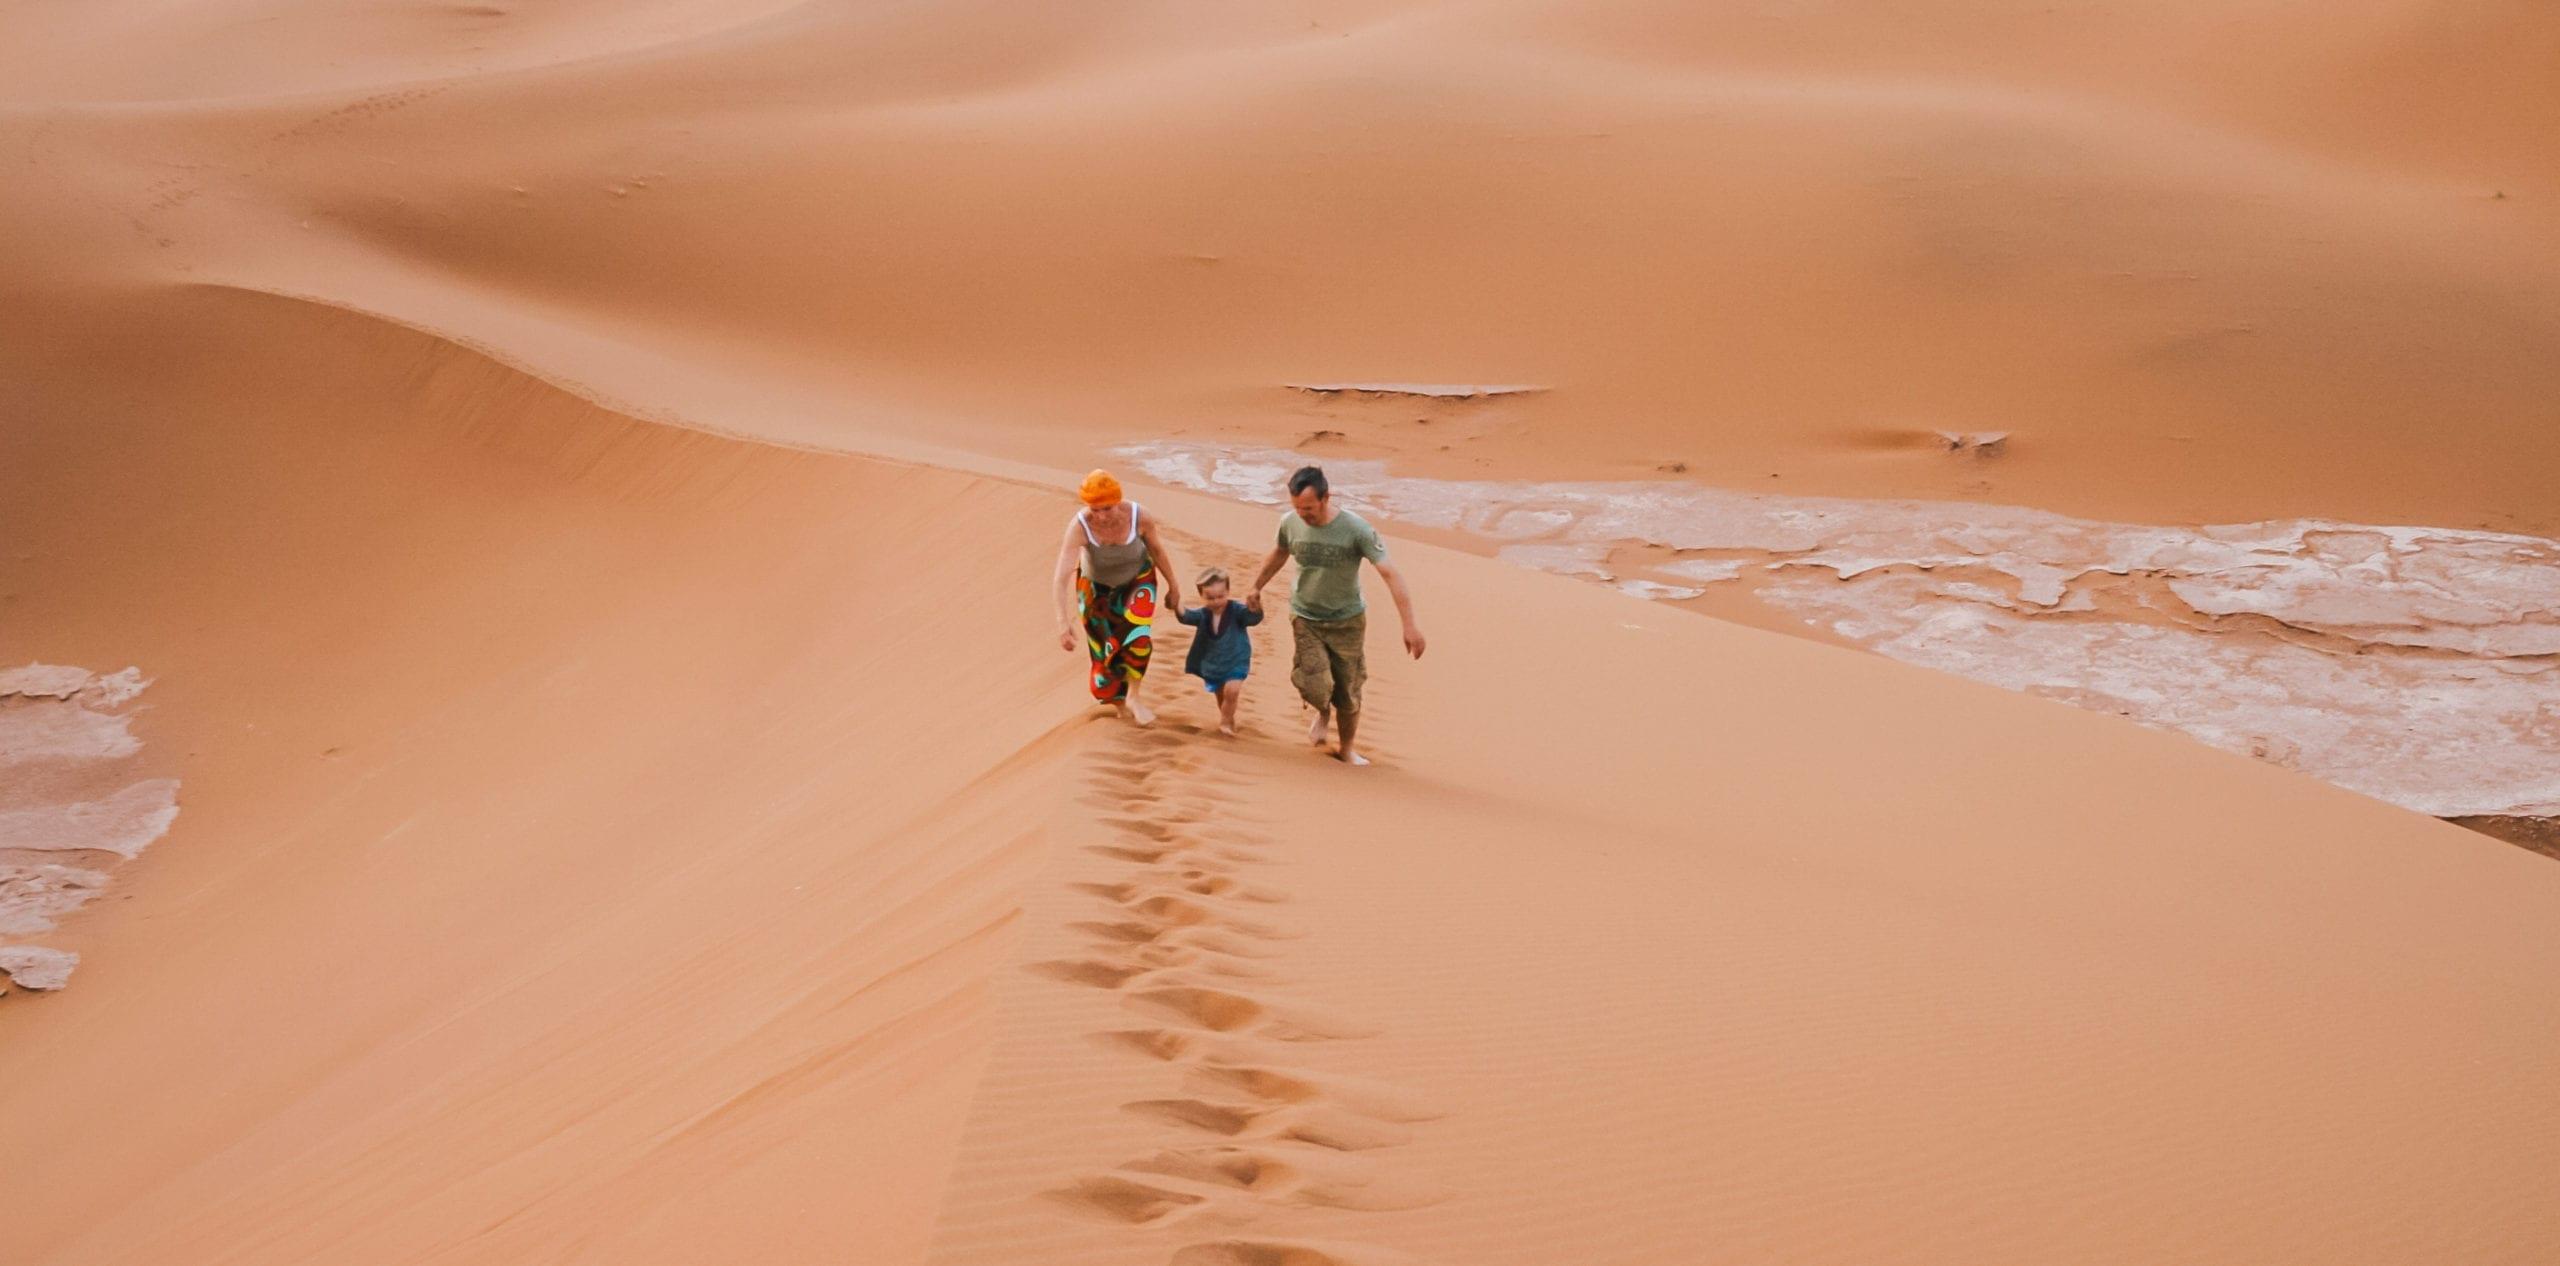 Sand Dune Family Holiday